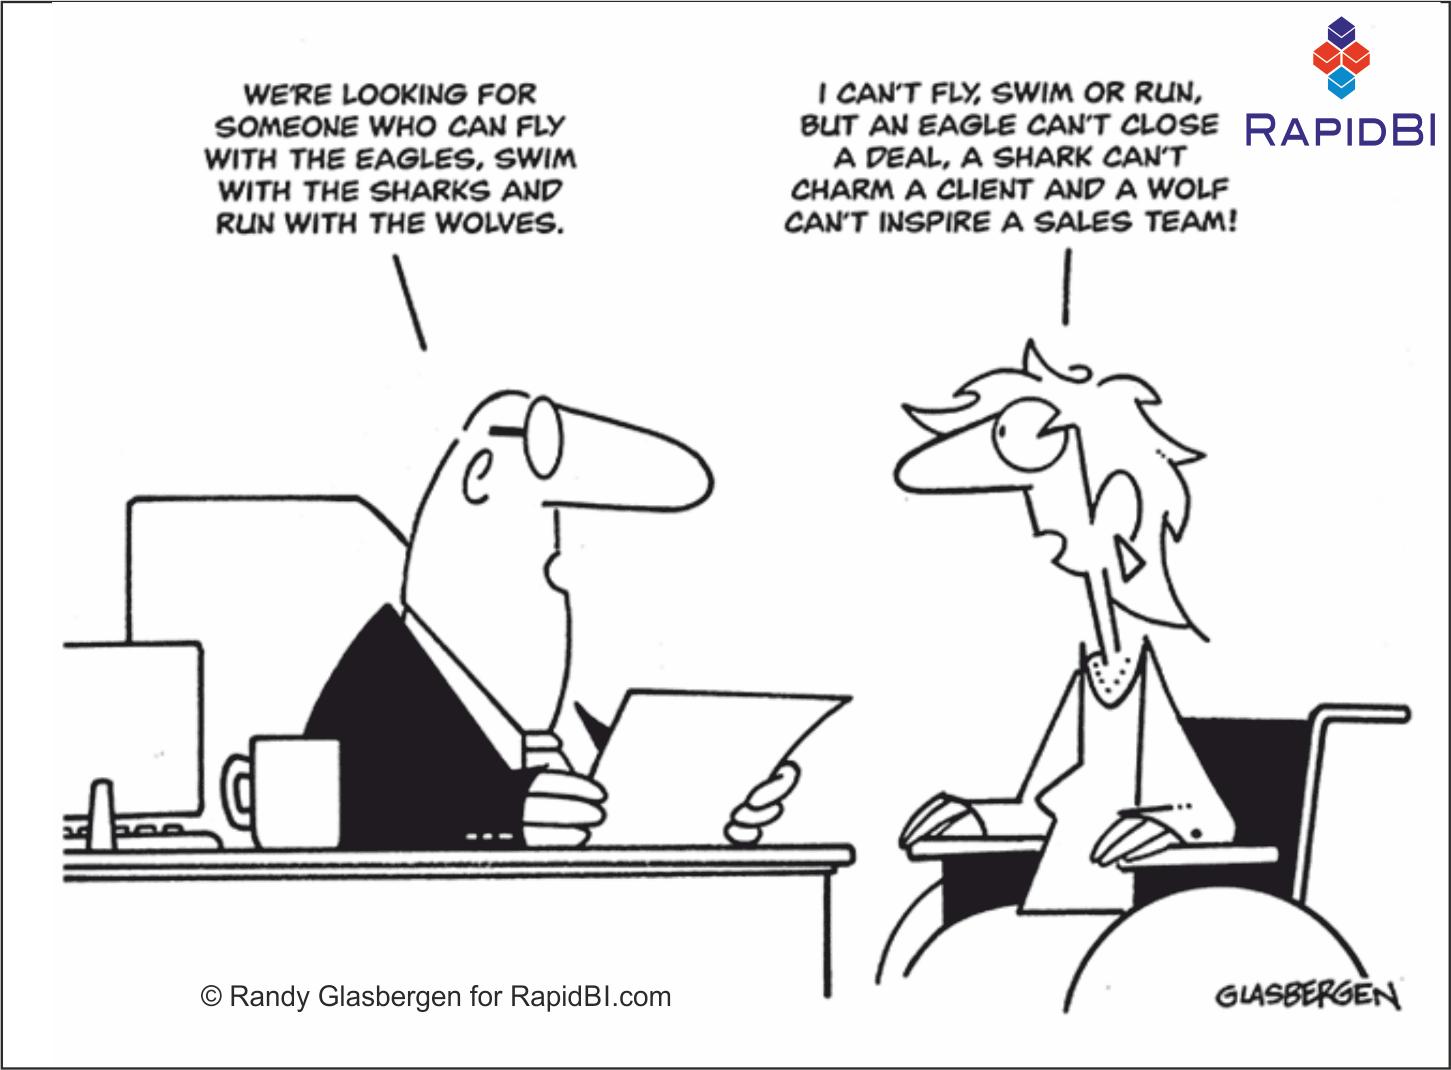 RapidBI Daily Cartoon #19